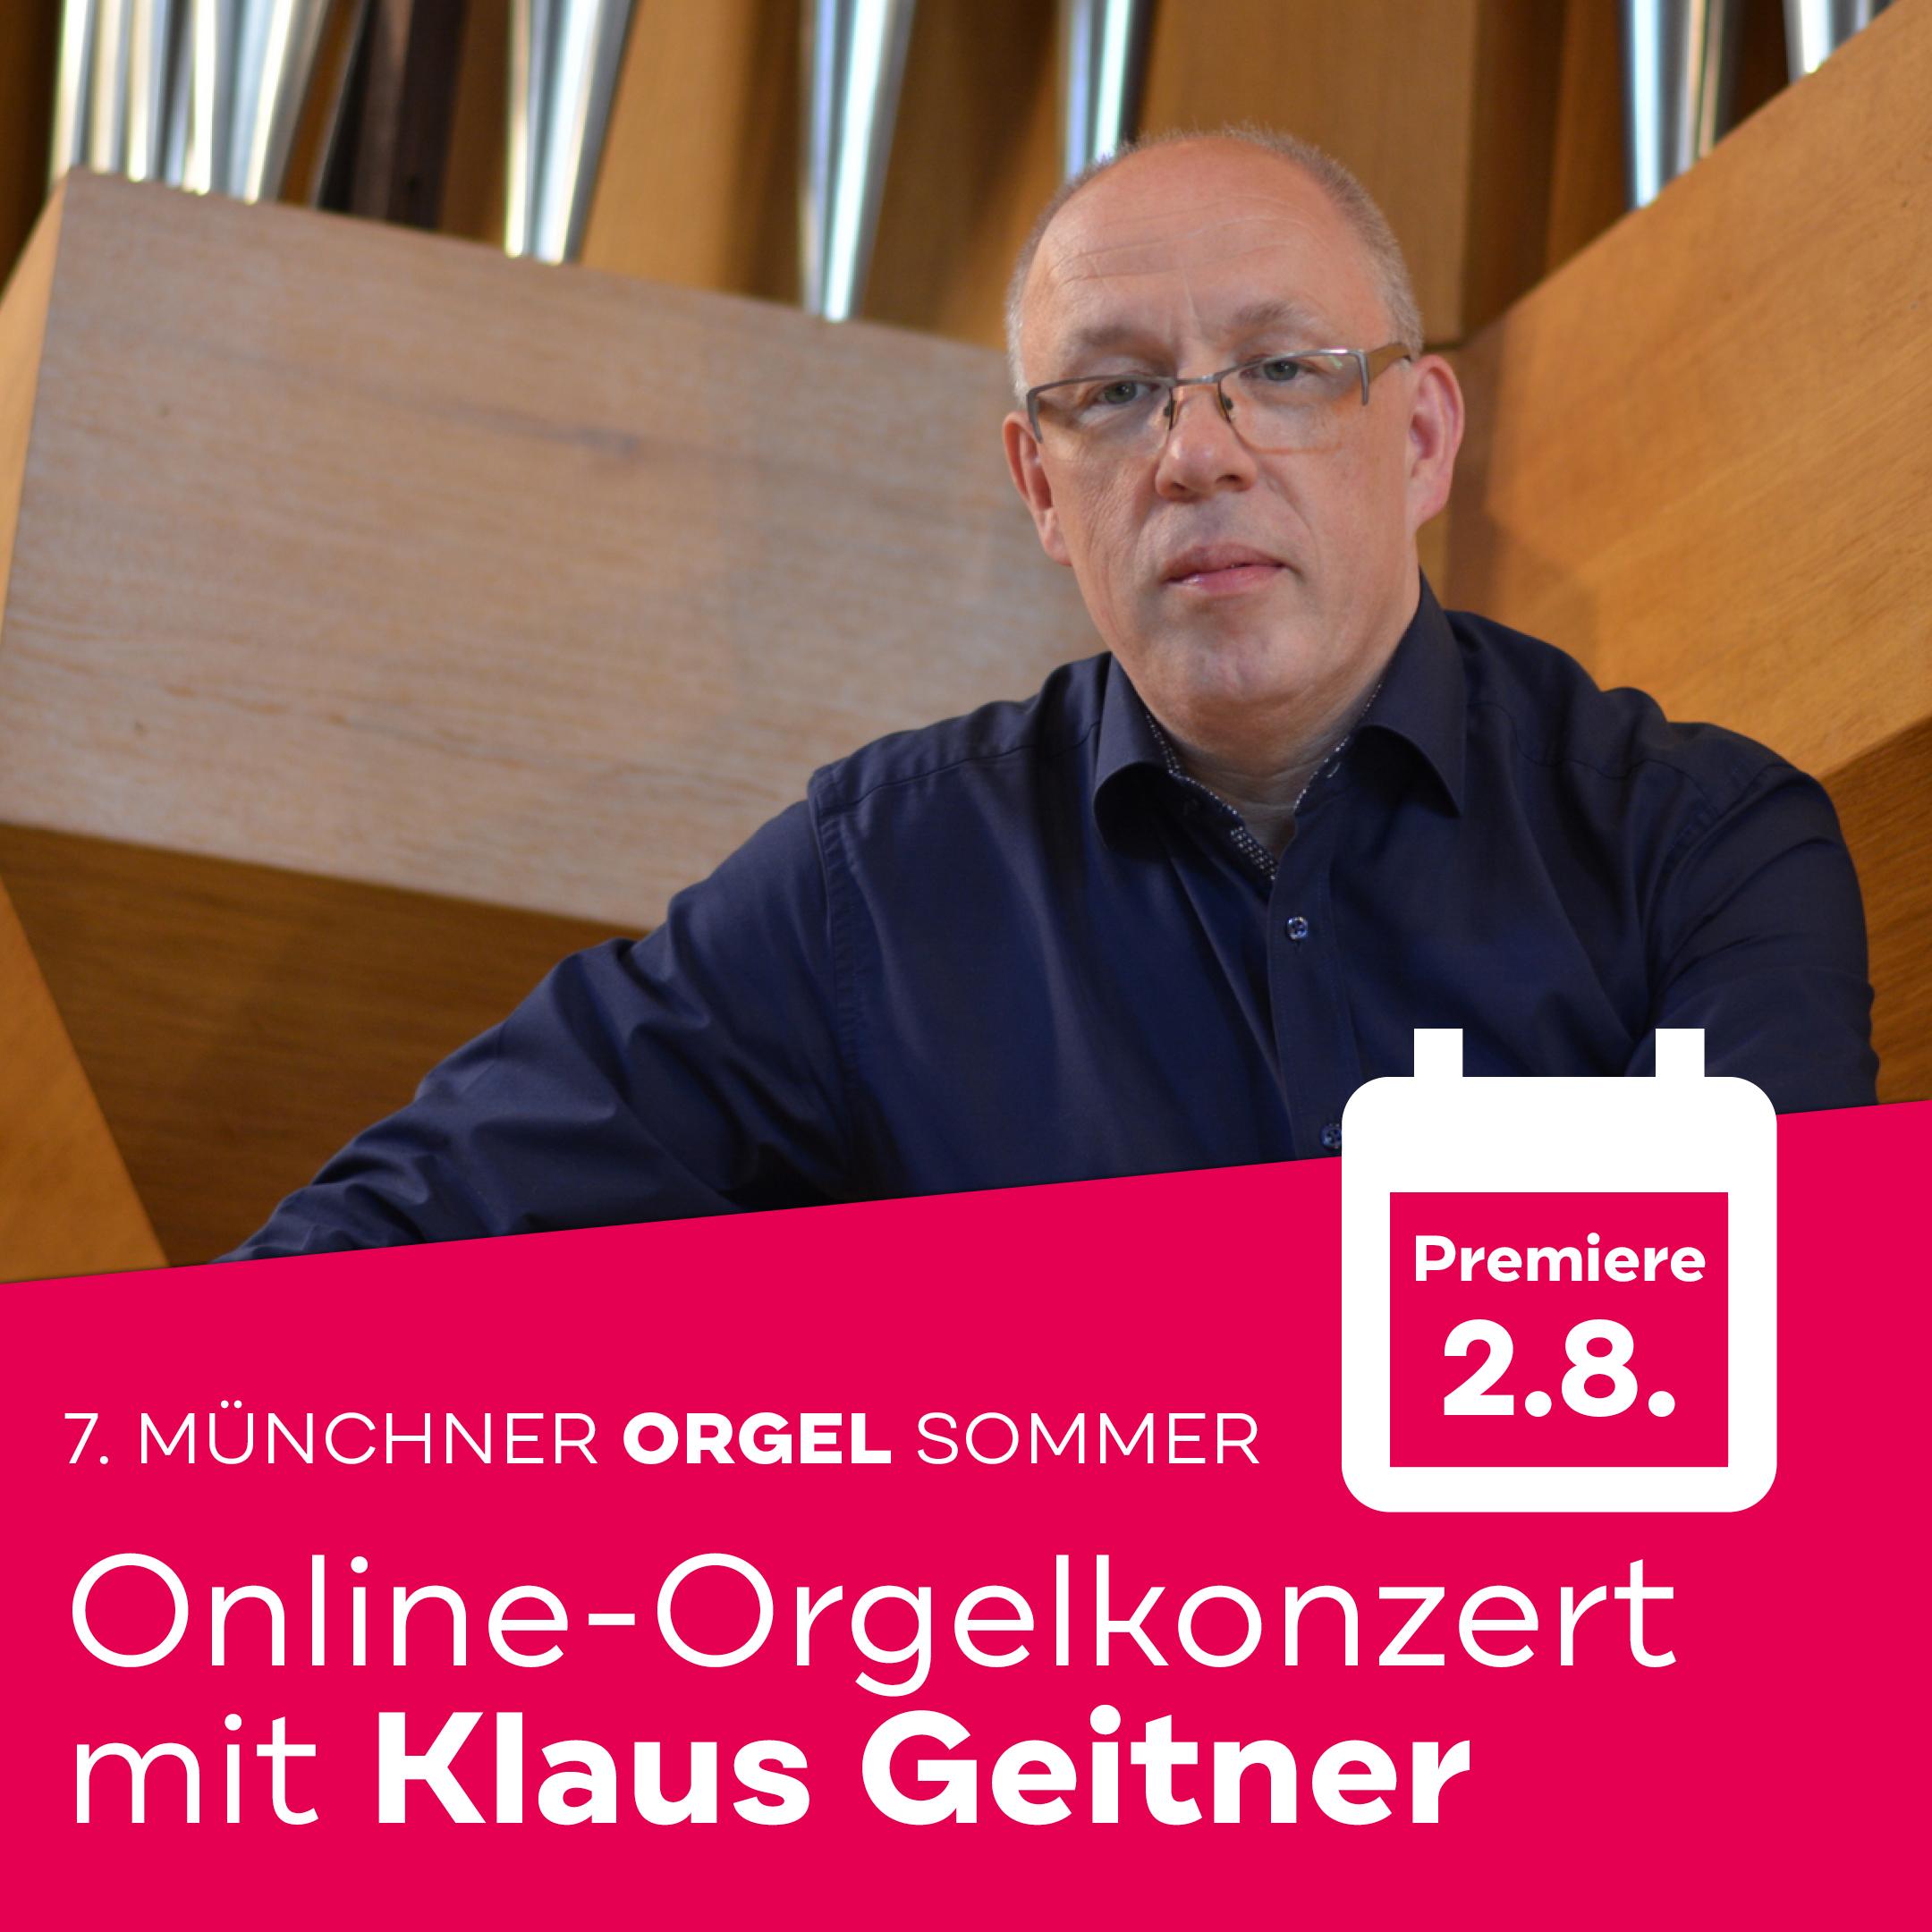 Post Klaus Geitner